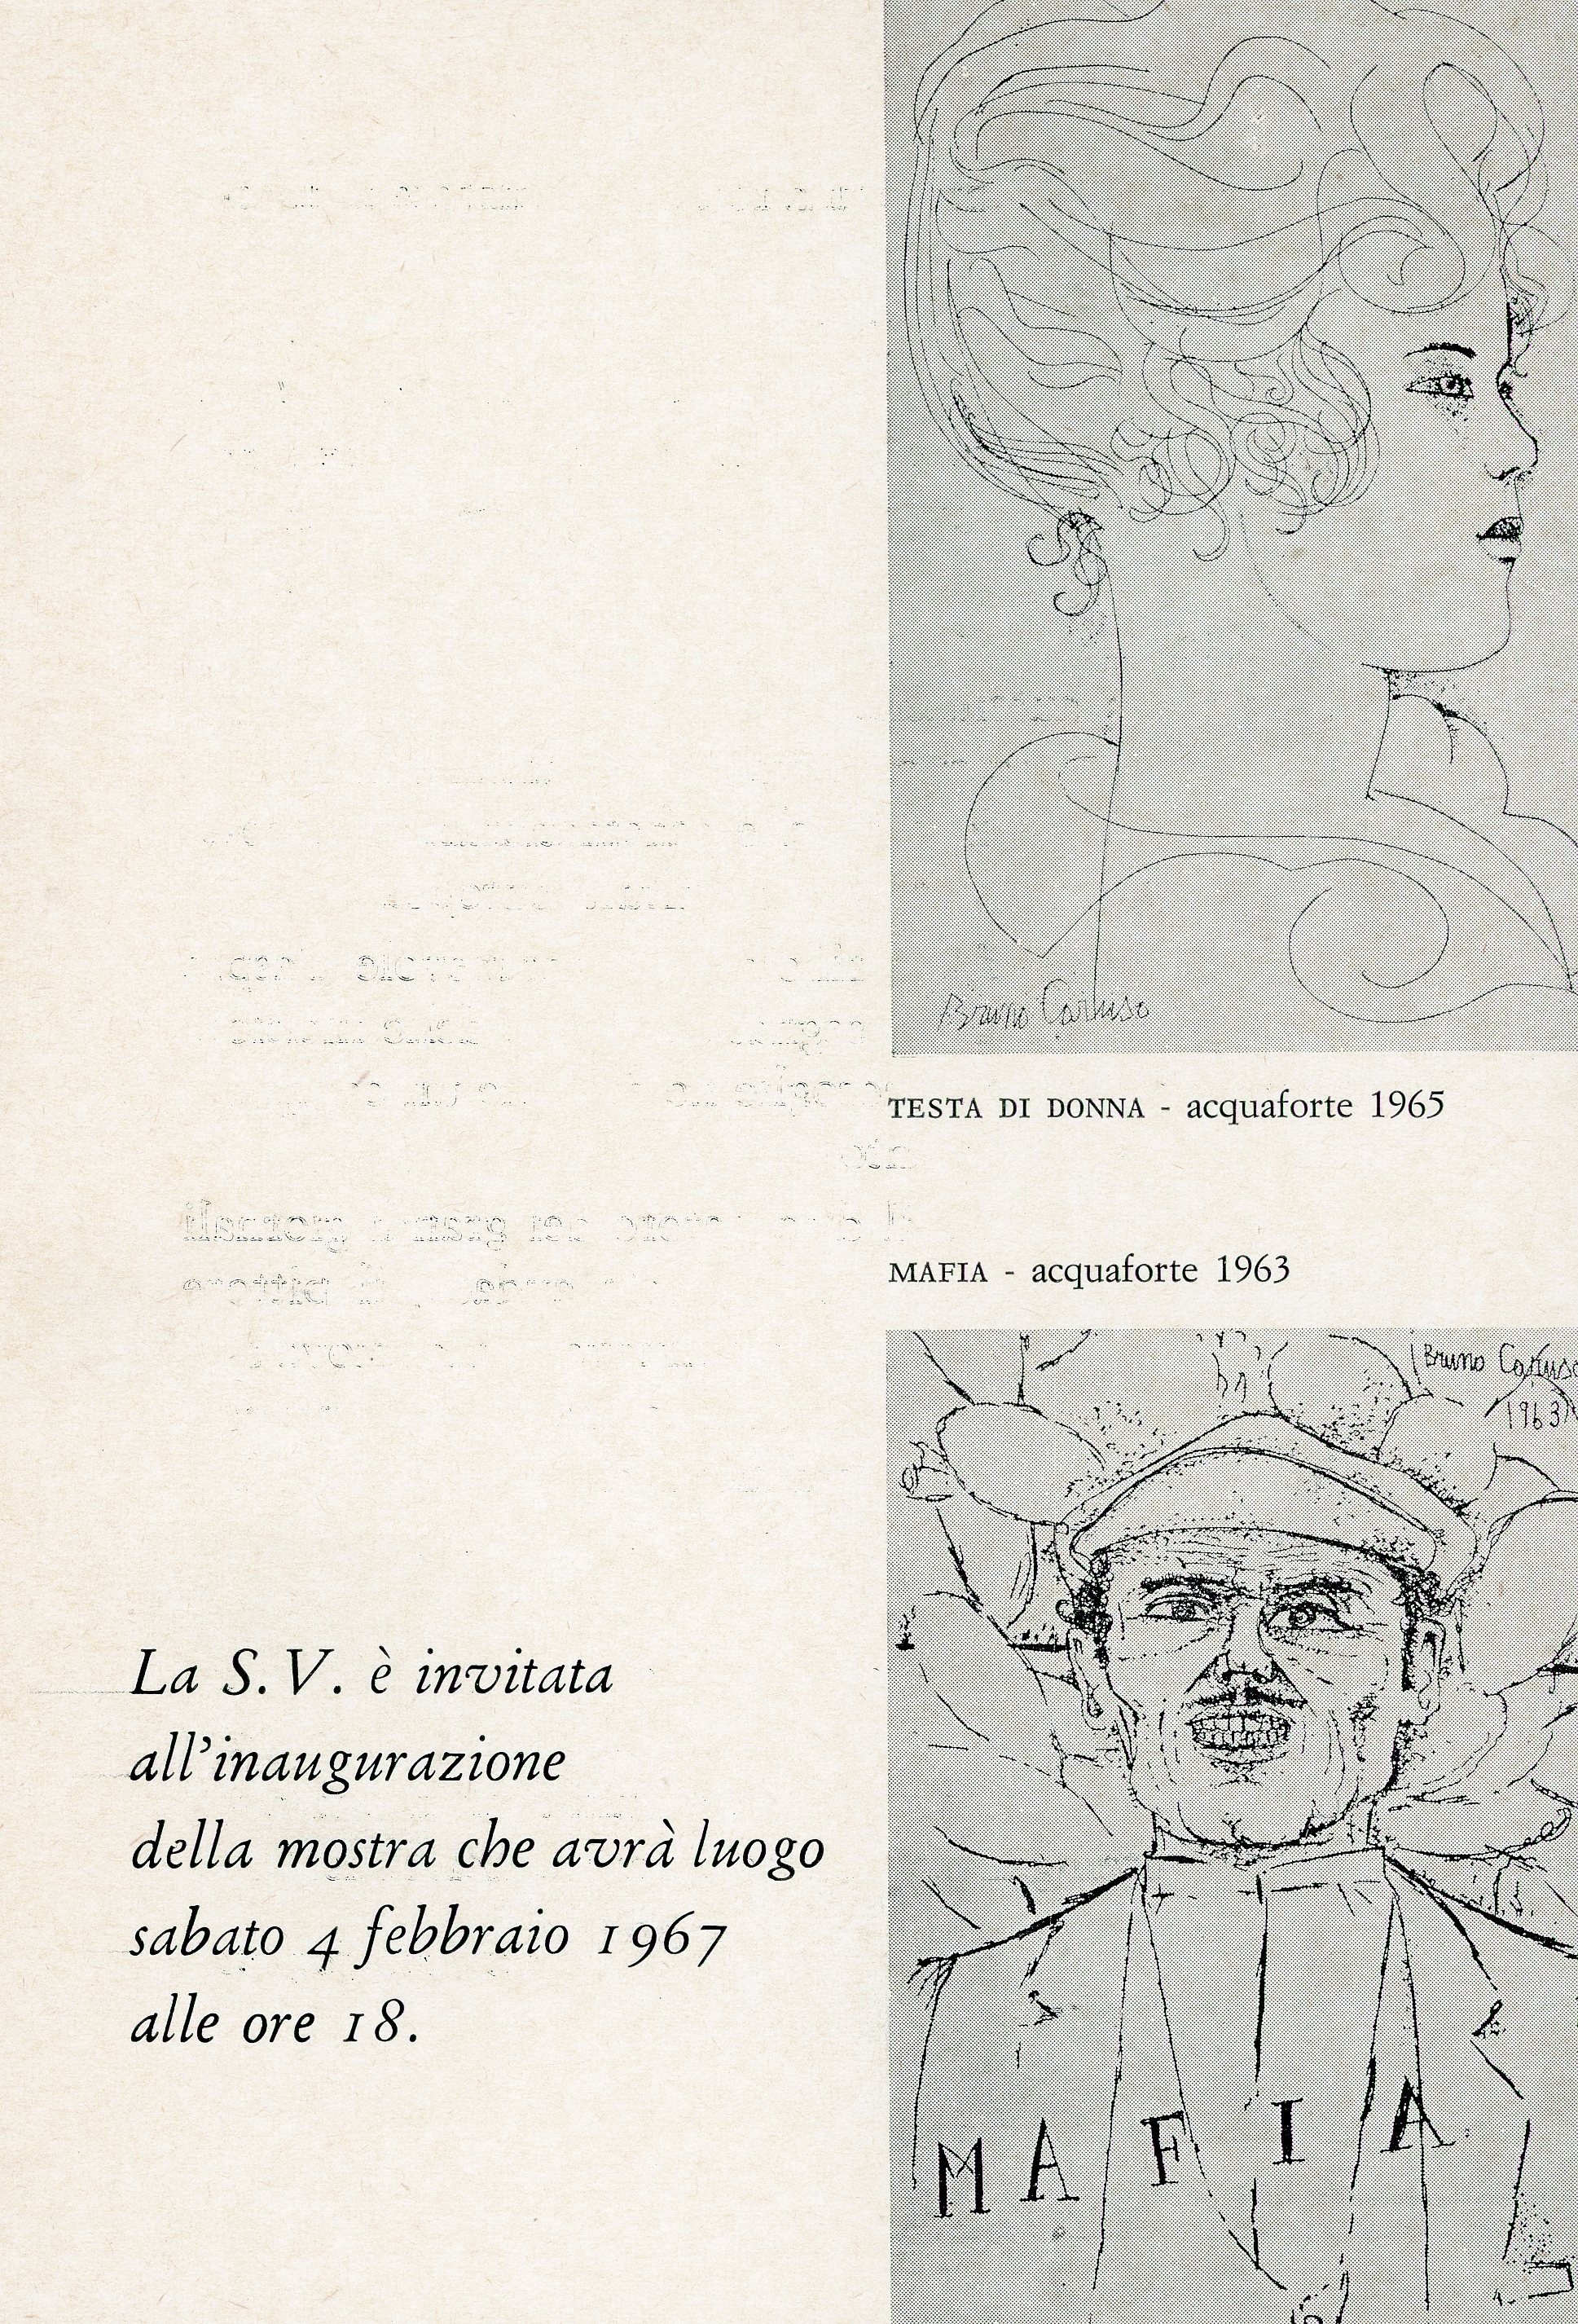 1967-02 Libreria Ghelfi - Bruno Caruso_06.jpg